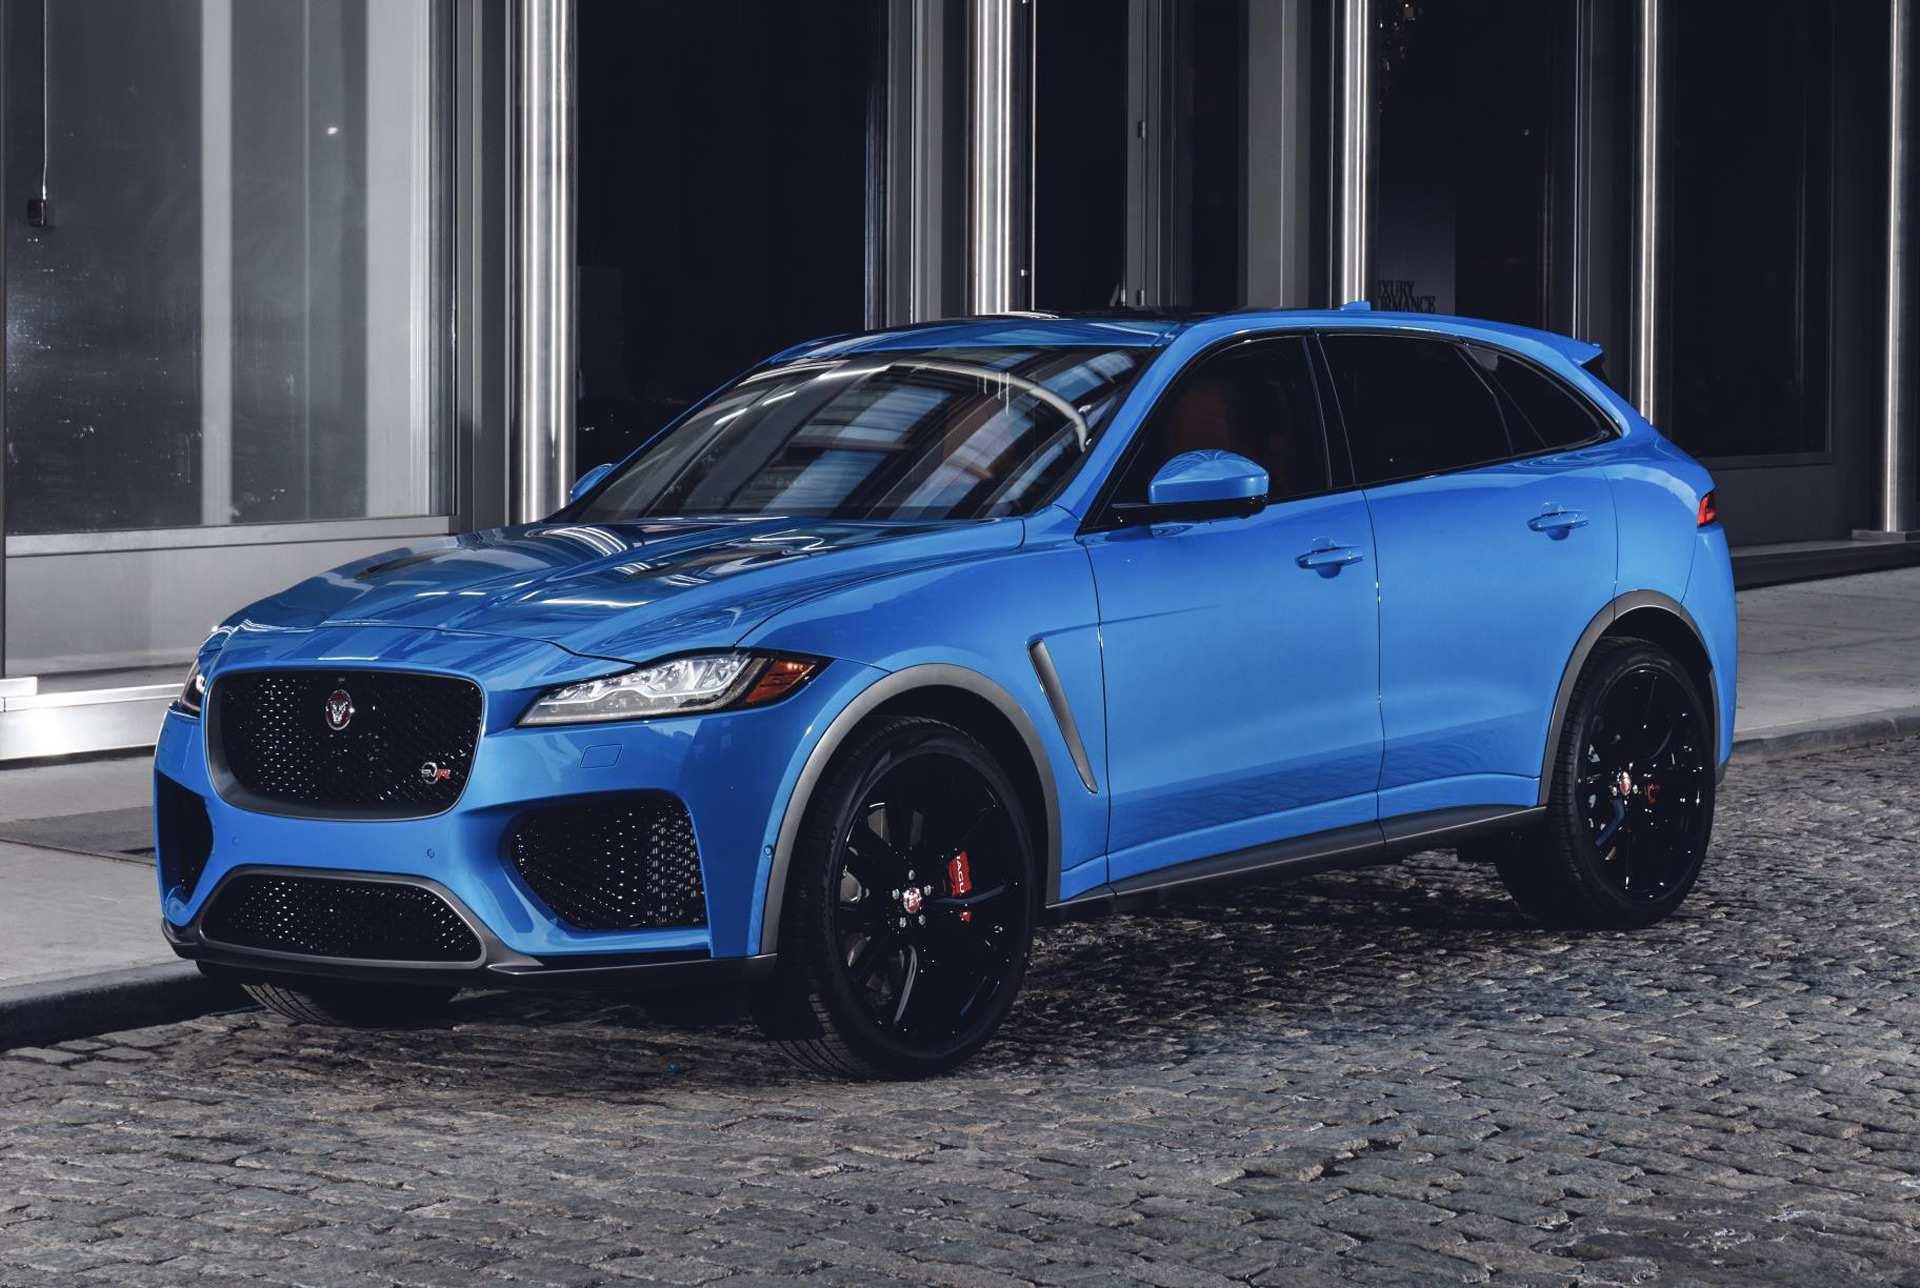 15 Gallery of 2019 Jaguar F Pace Svr 2 Spesification by 2019 Jaguar F Pace Svr 2